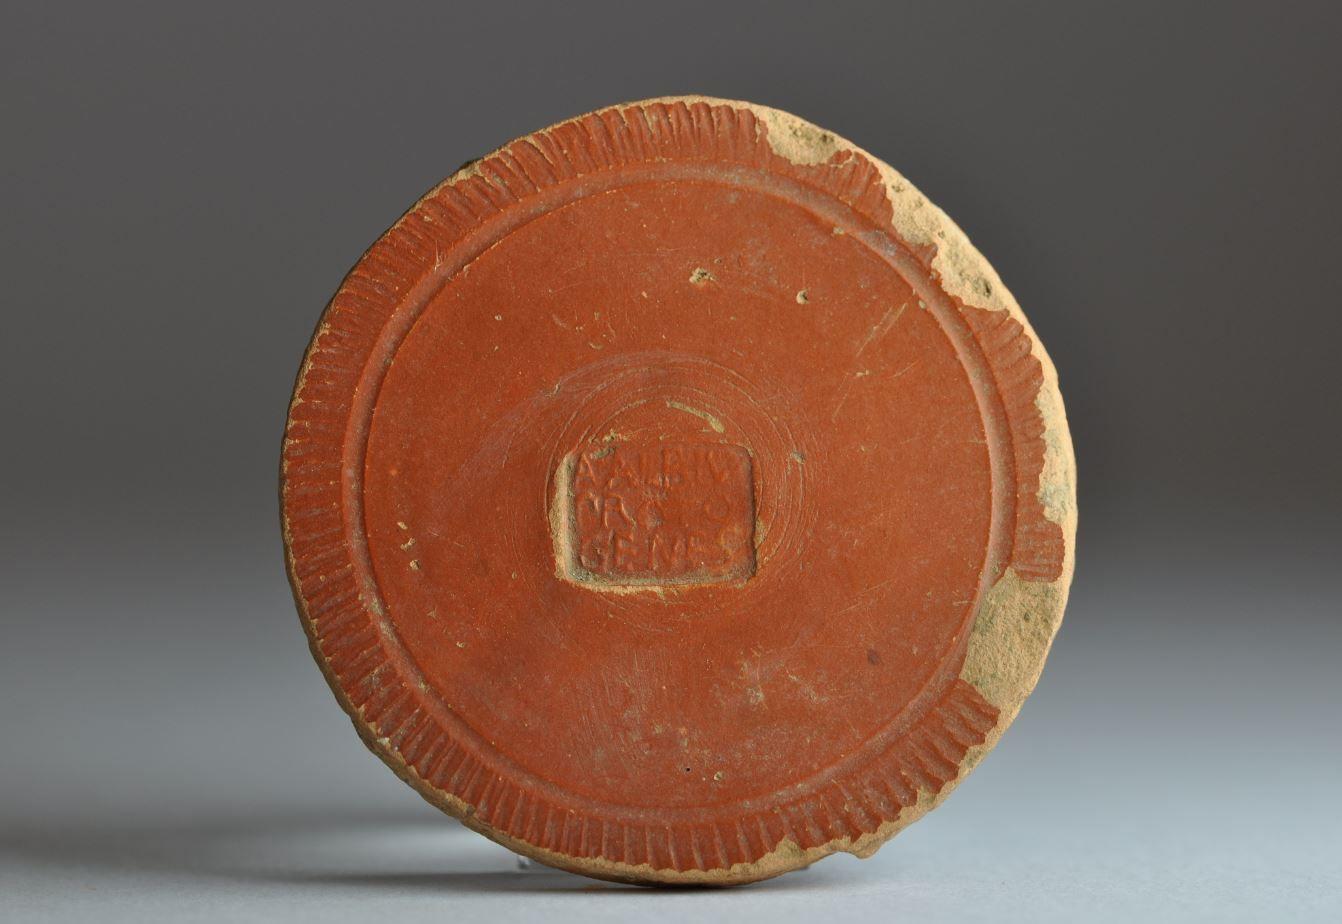 The discovery of the terra sigillata mold samina ware